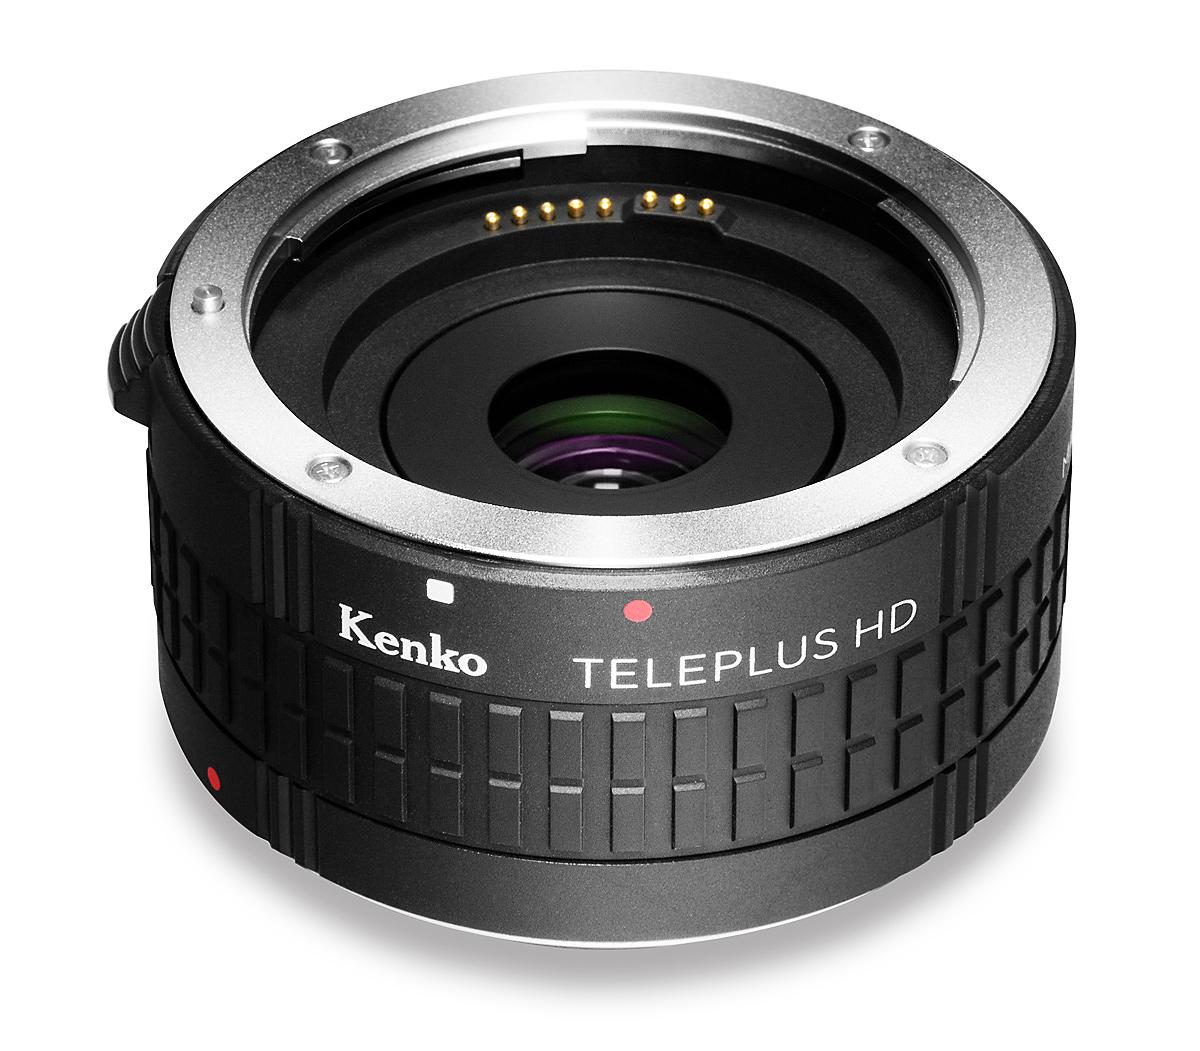 Kenko TELEPLUS HD DGX 2.0X